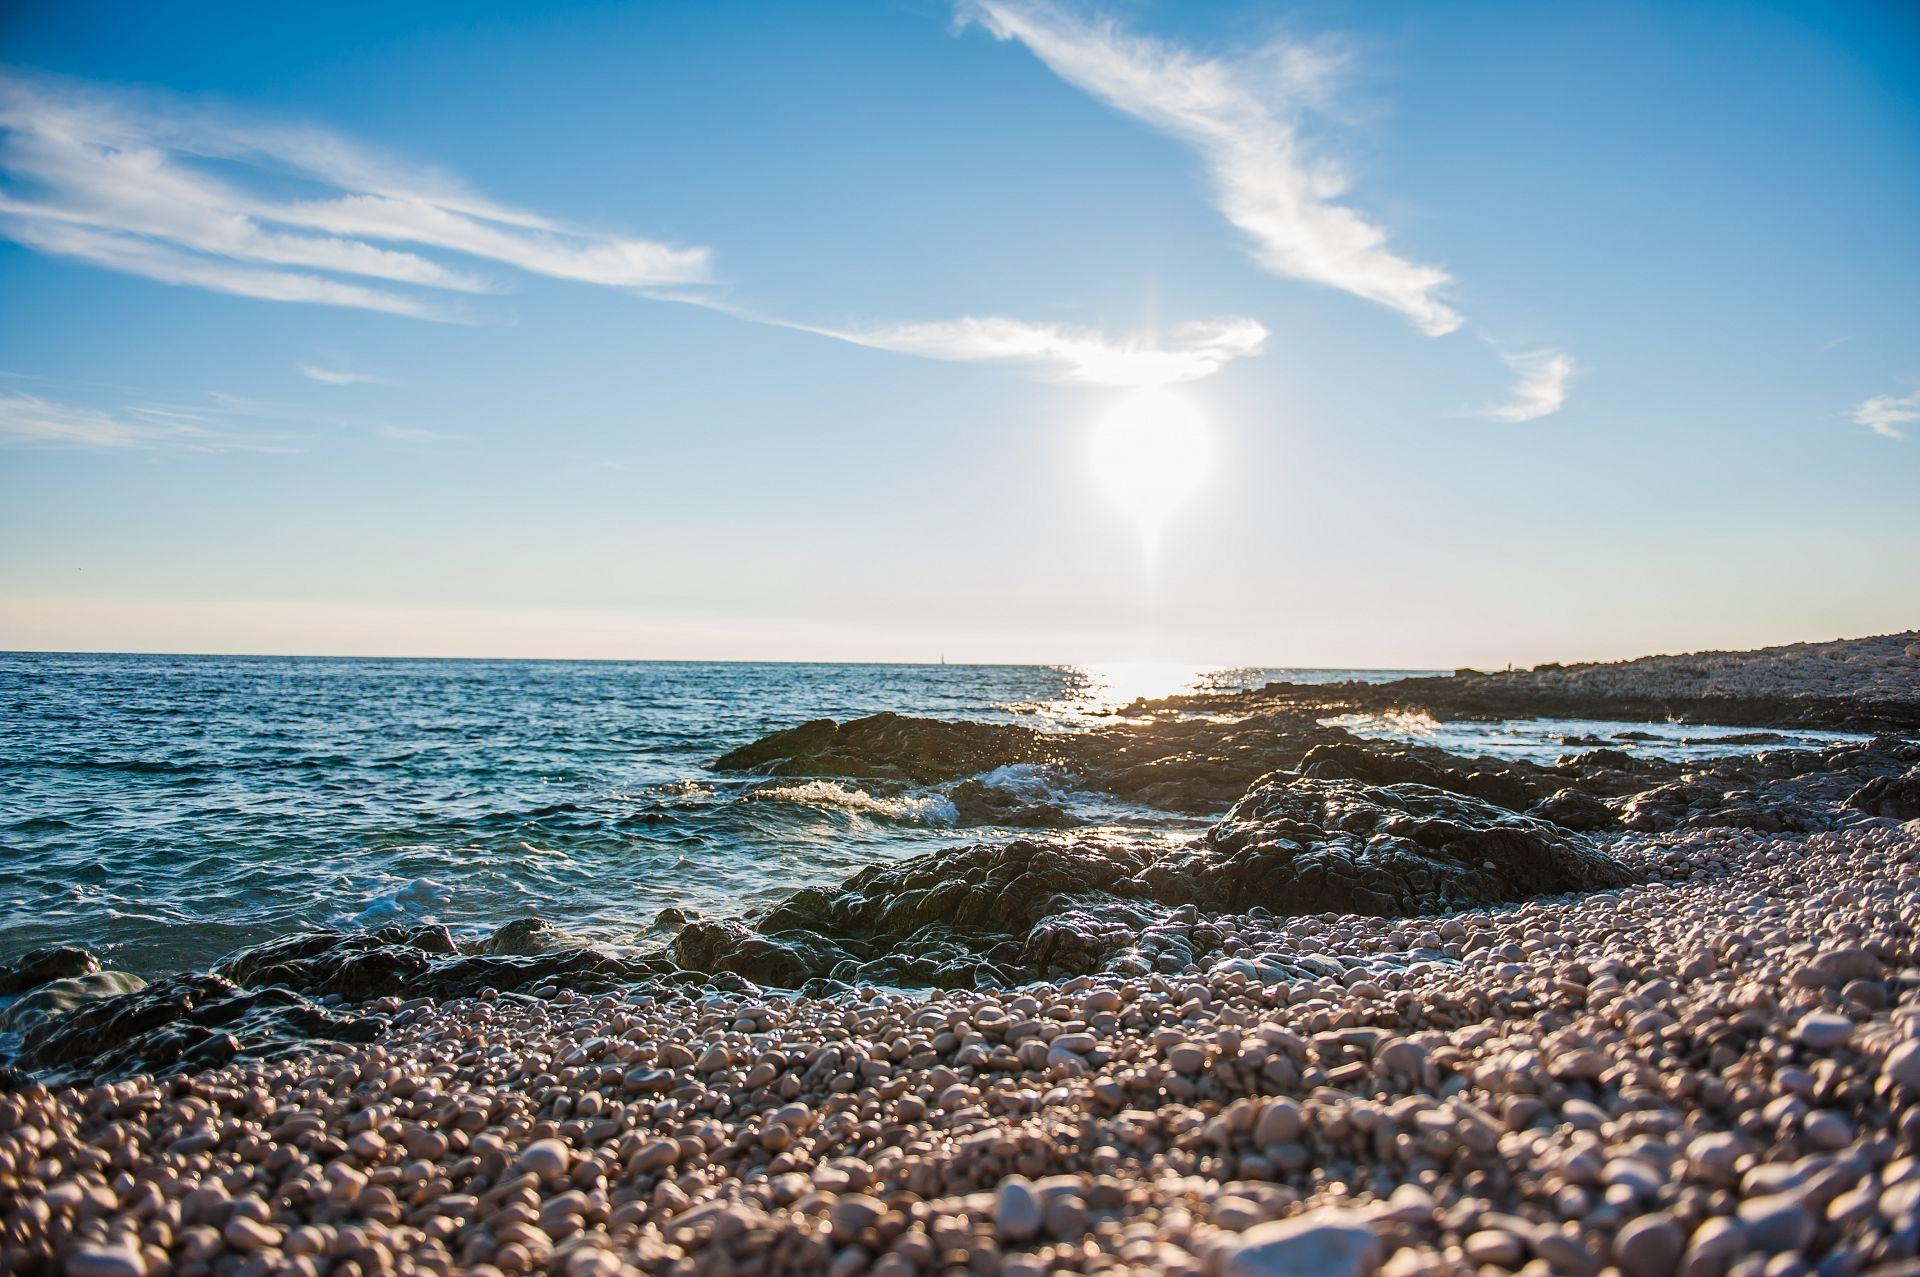 Ferienwohnung 01106ROGO A2(6+2) - Bucht Kanica (Rogoznica) (741933), Rogoznica, , Dalmatien, Kroatien, Bild 7